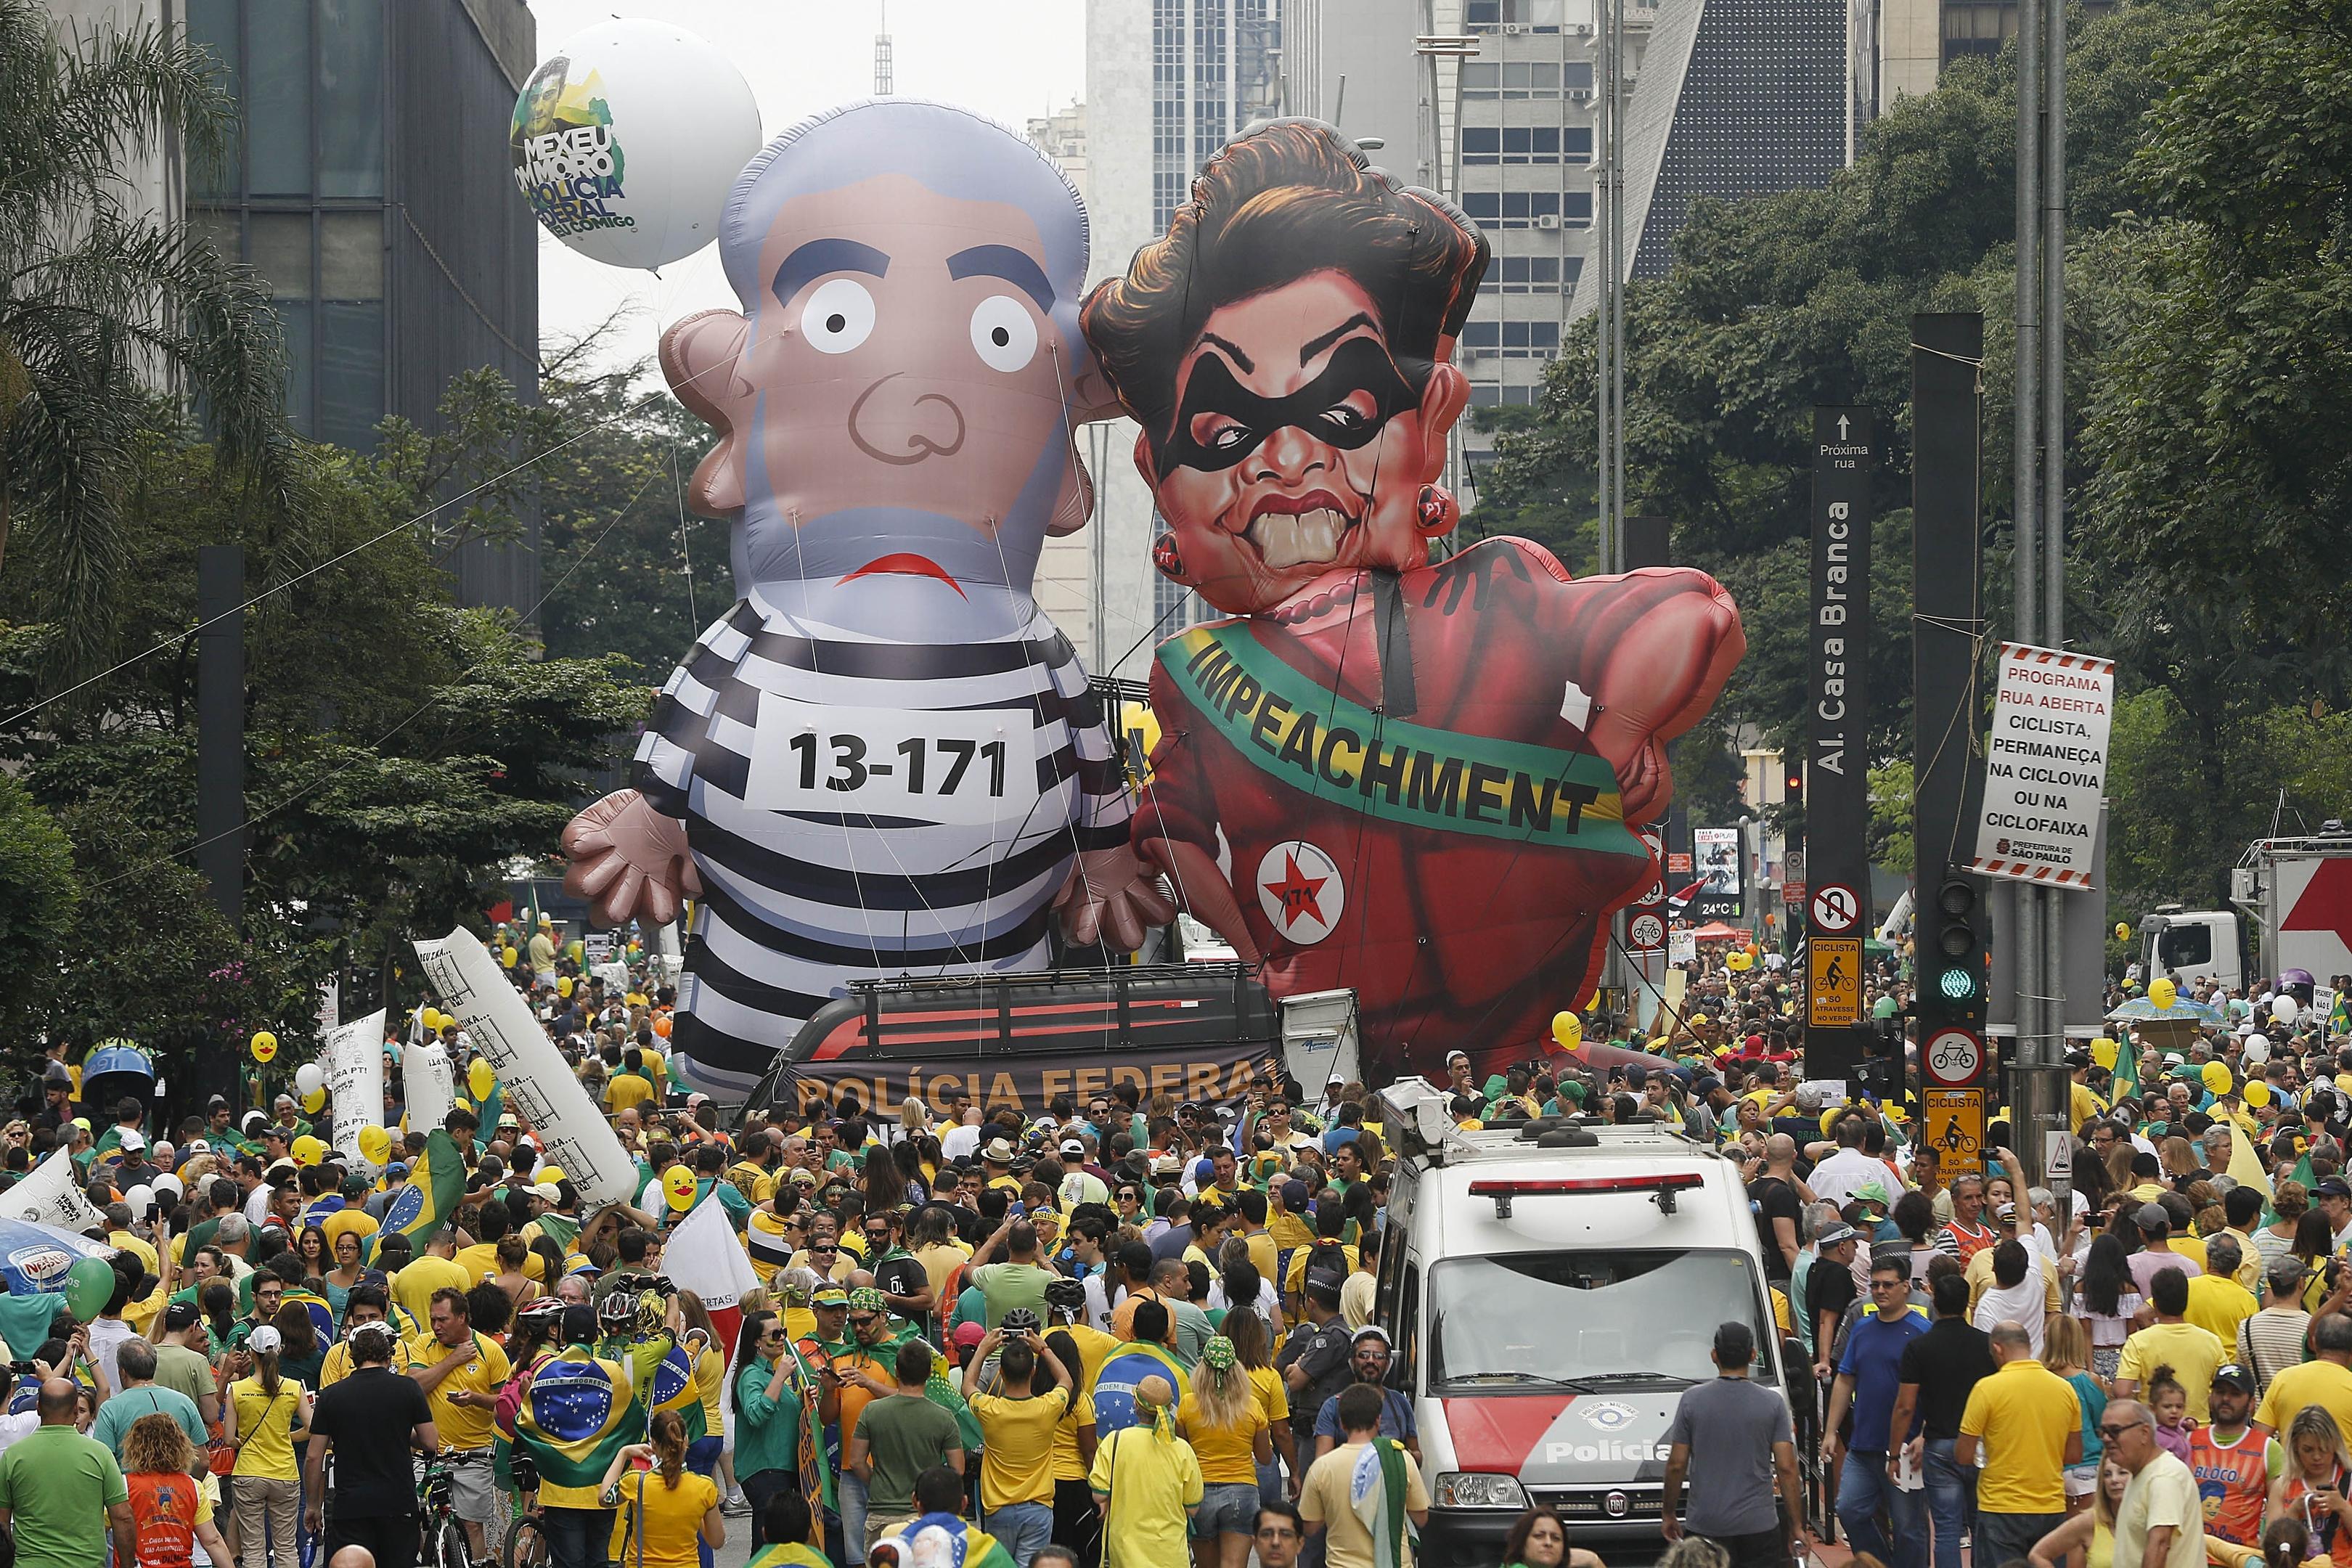 Demonstrators parade in Brazil over political corruption frustrations